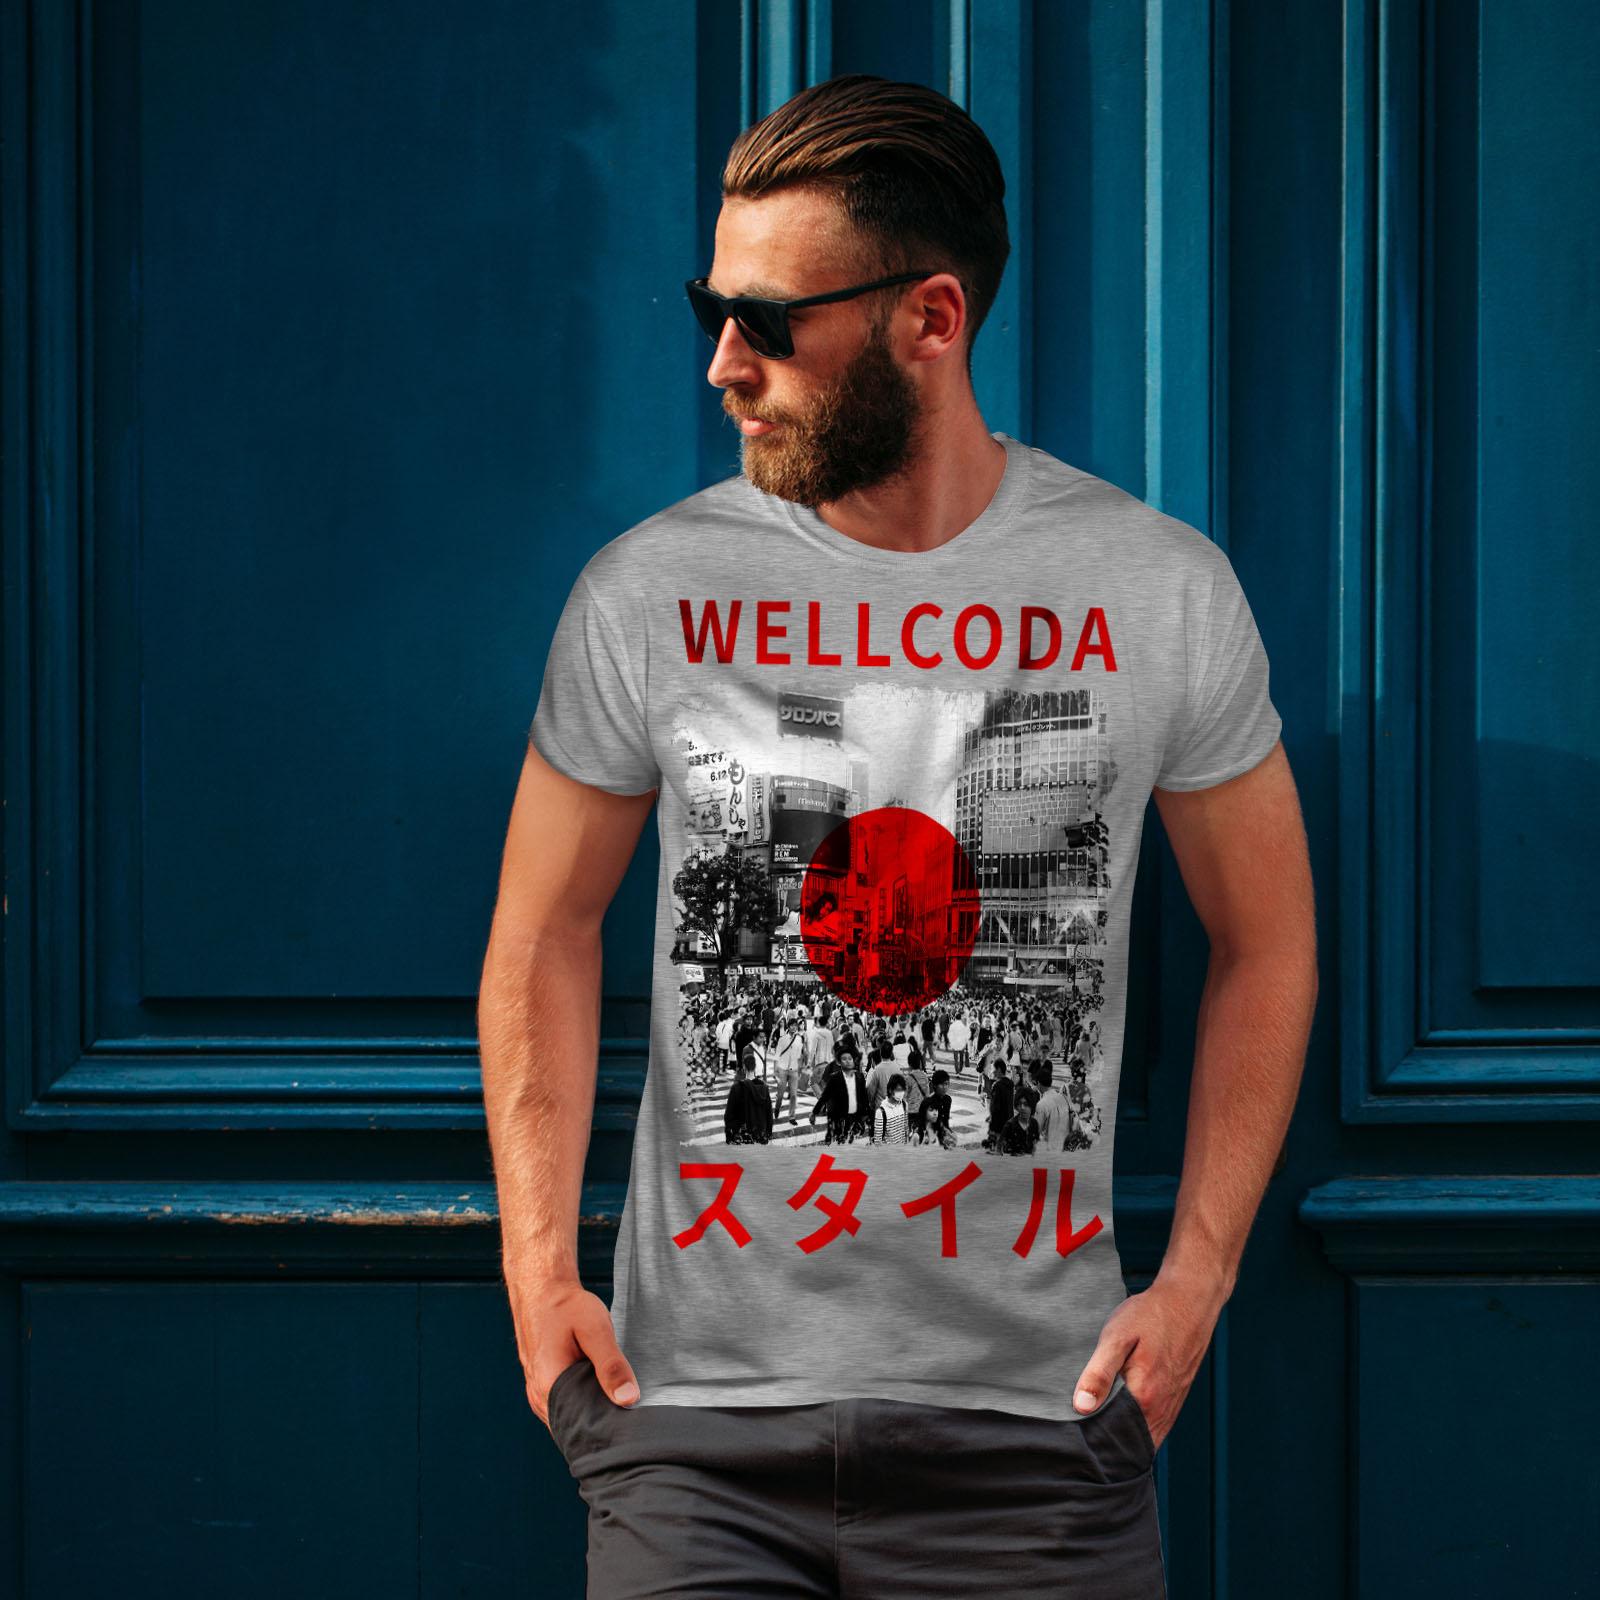 Japanese Graphic Design Printed Tee Wellcoda Japan Style Flag Mens T-shirt